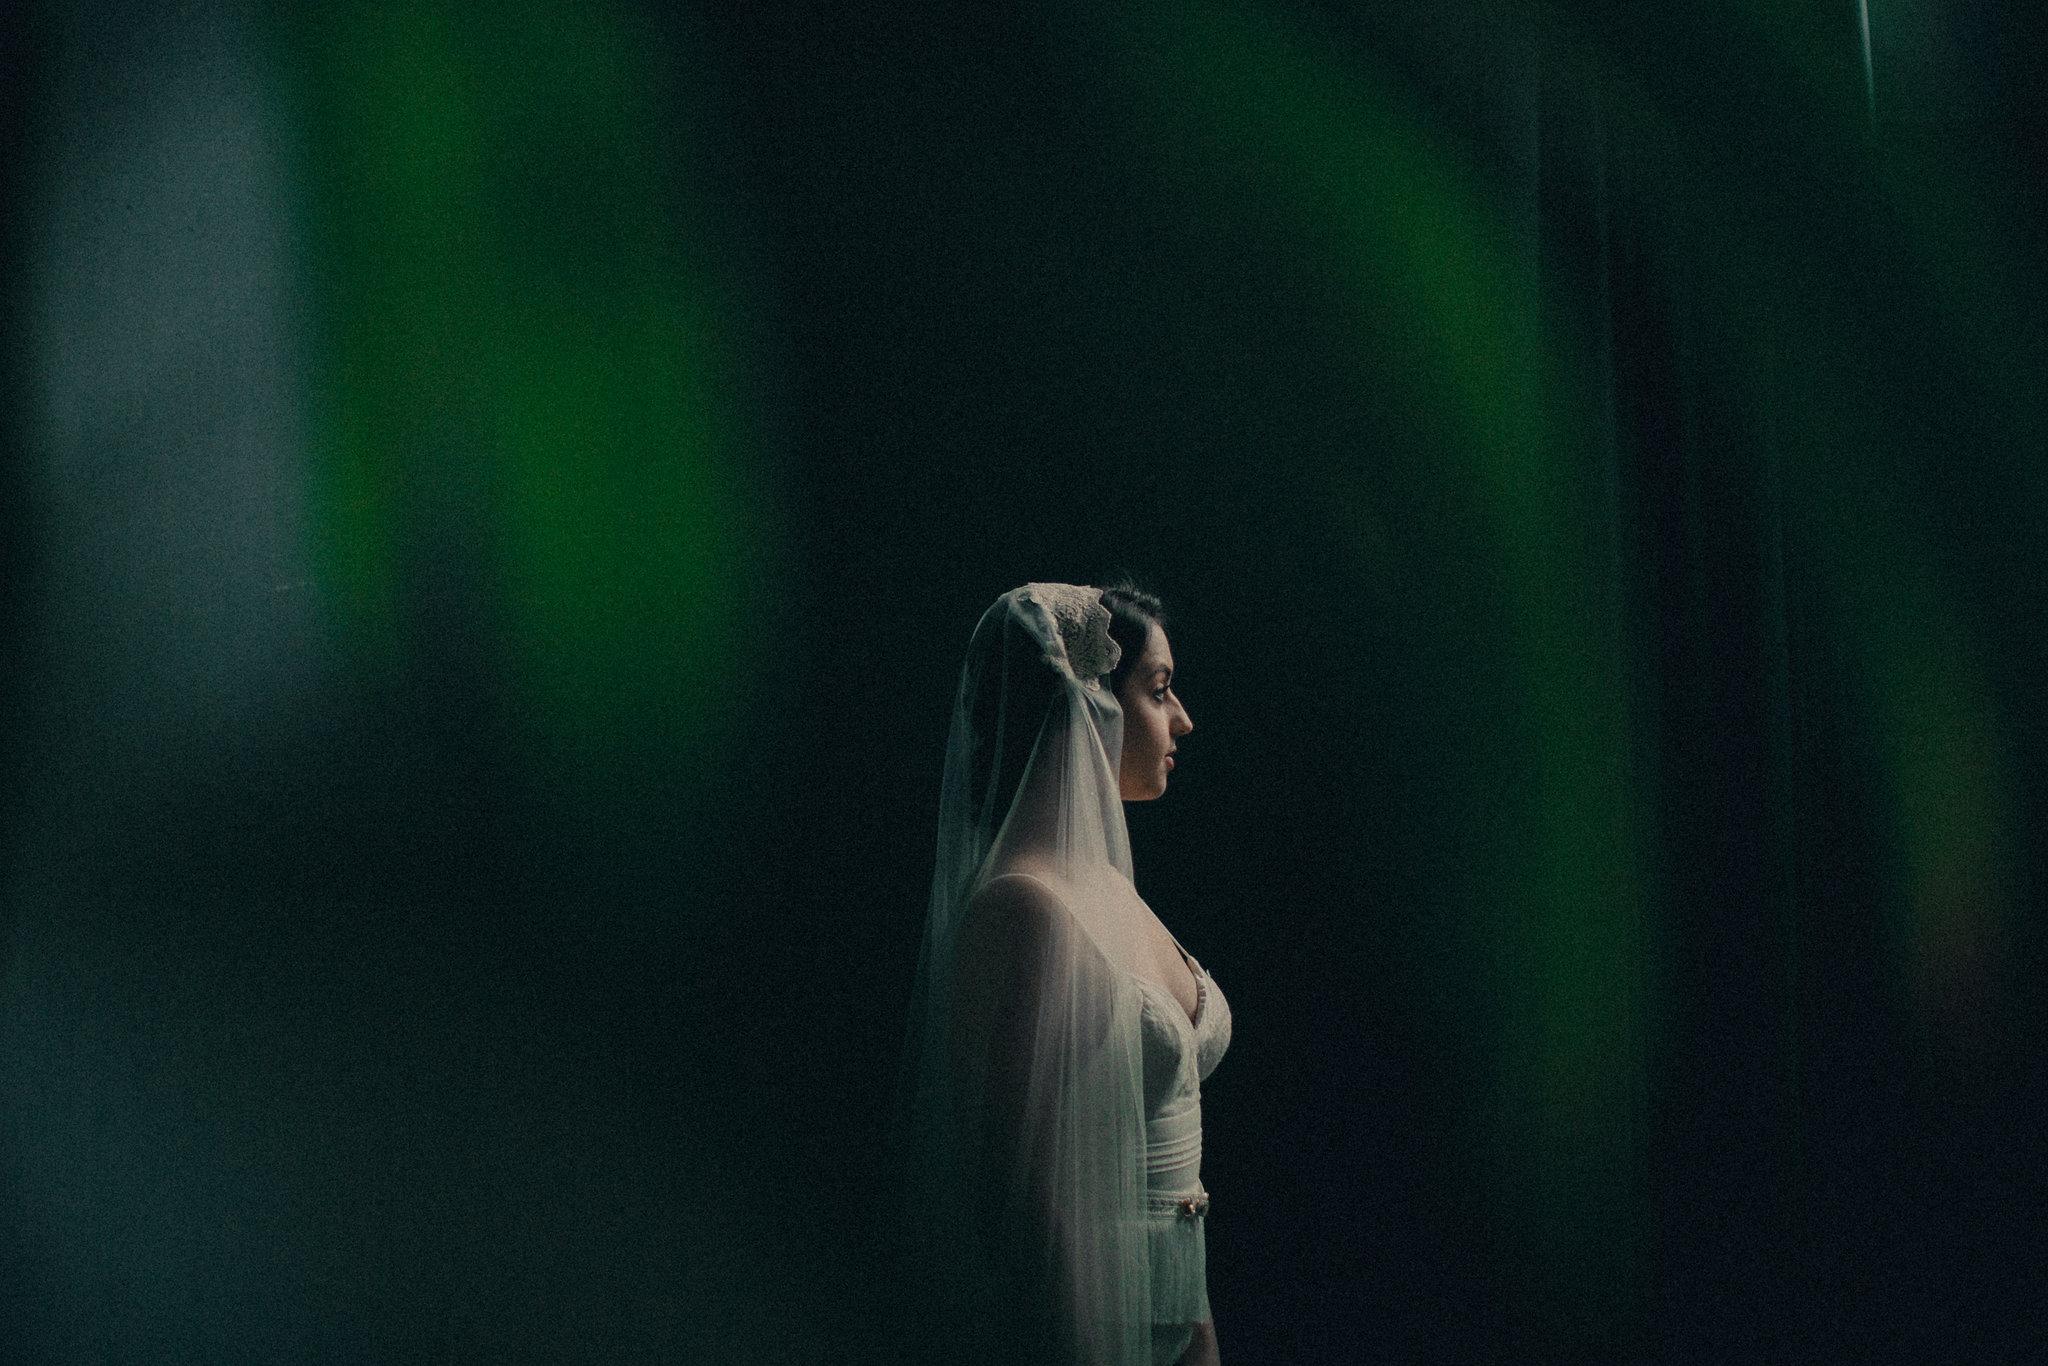 Williamsburg_Hotel_Wedding_Photographer_Chellise_Michael_Photography-313.jpg